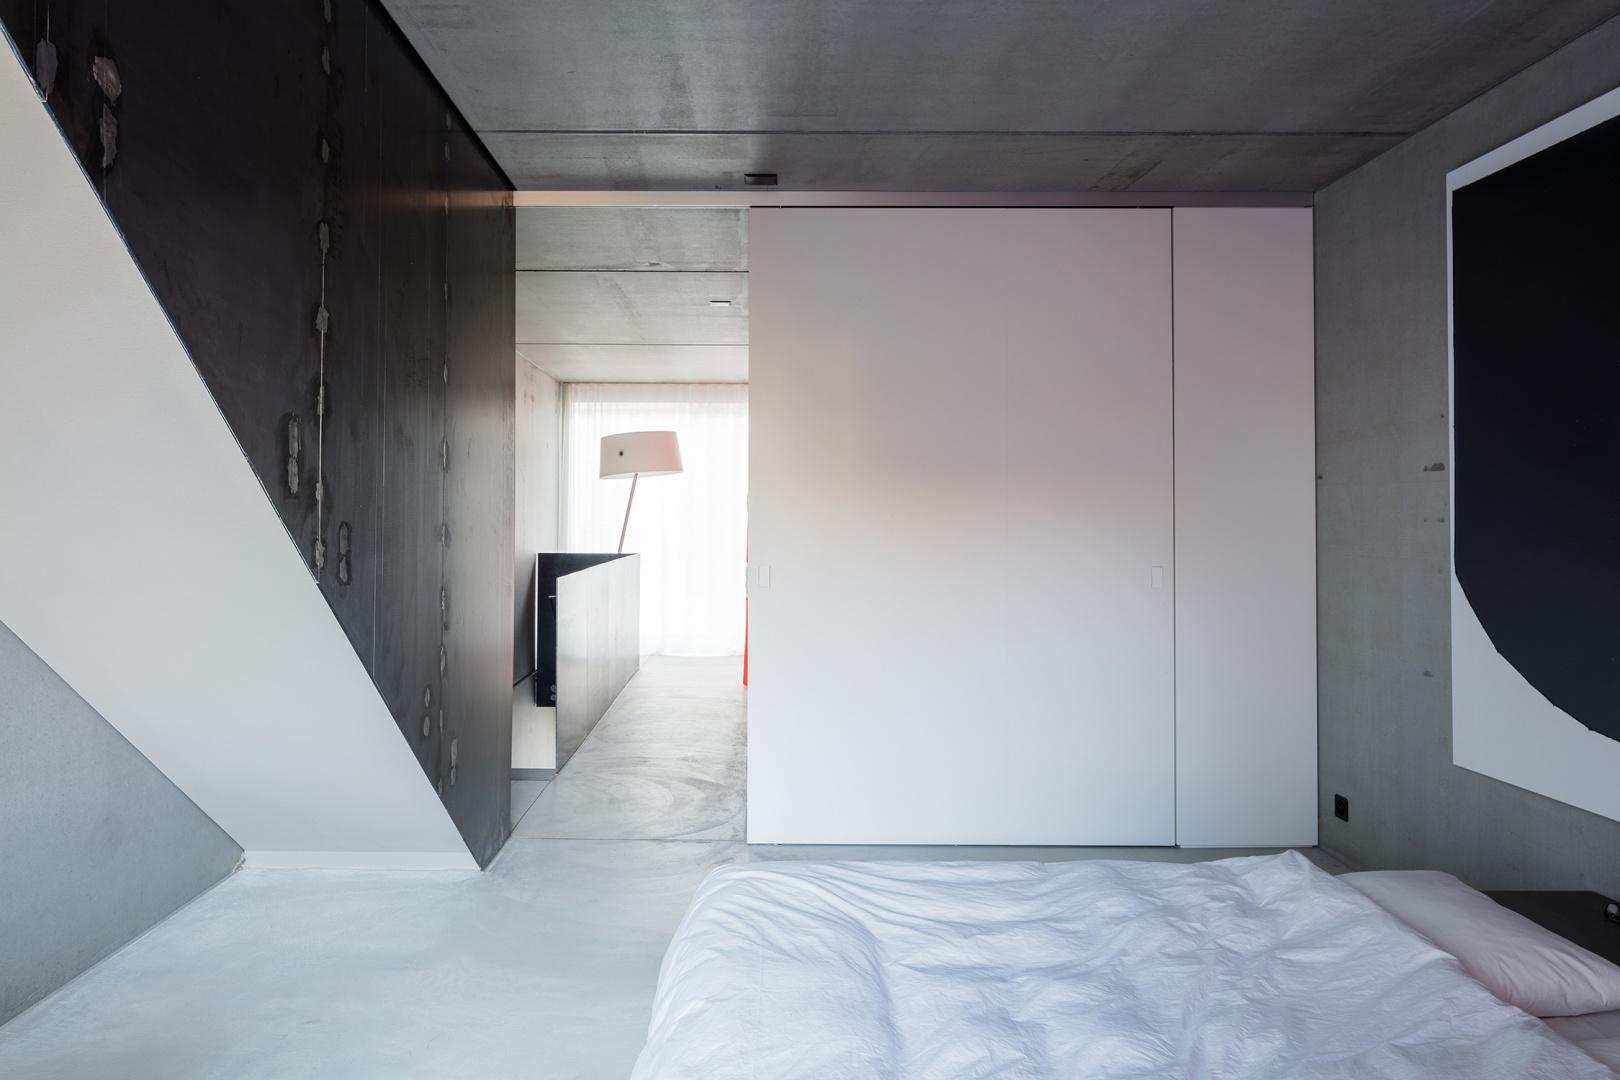 Schlafzimmer © Radek Brunecky